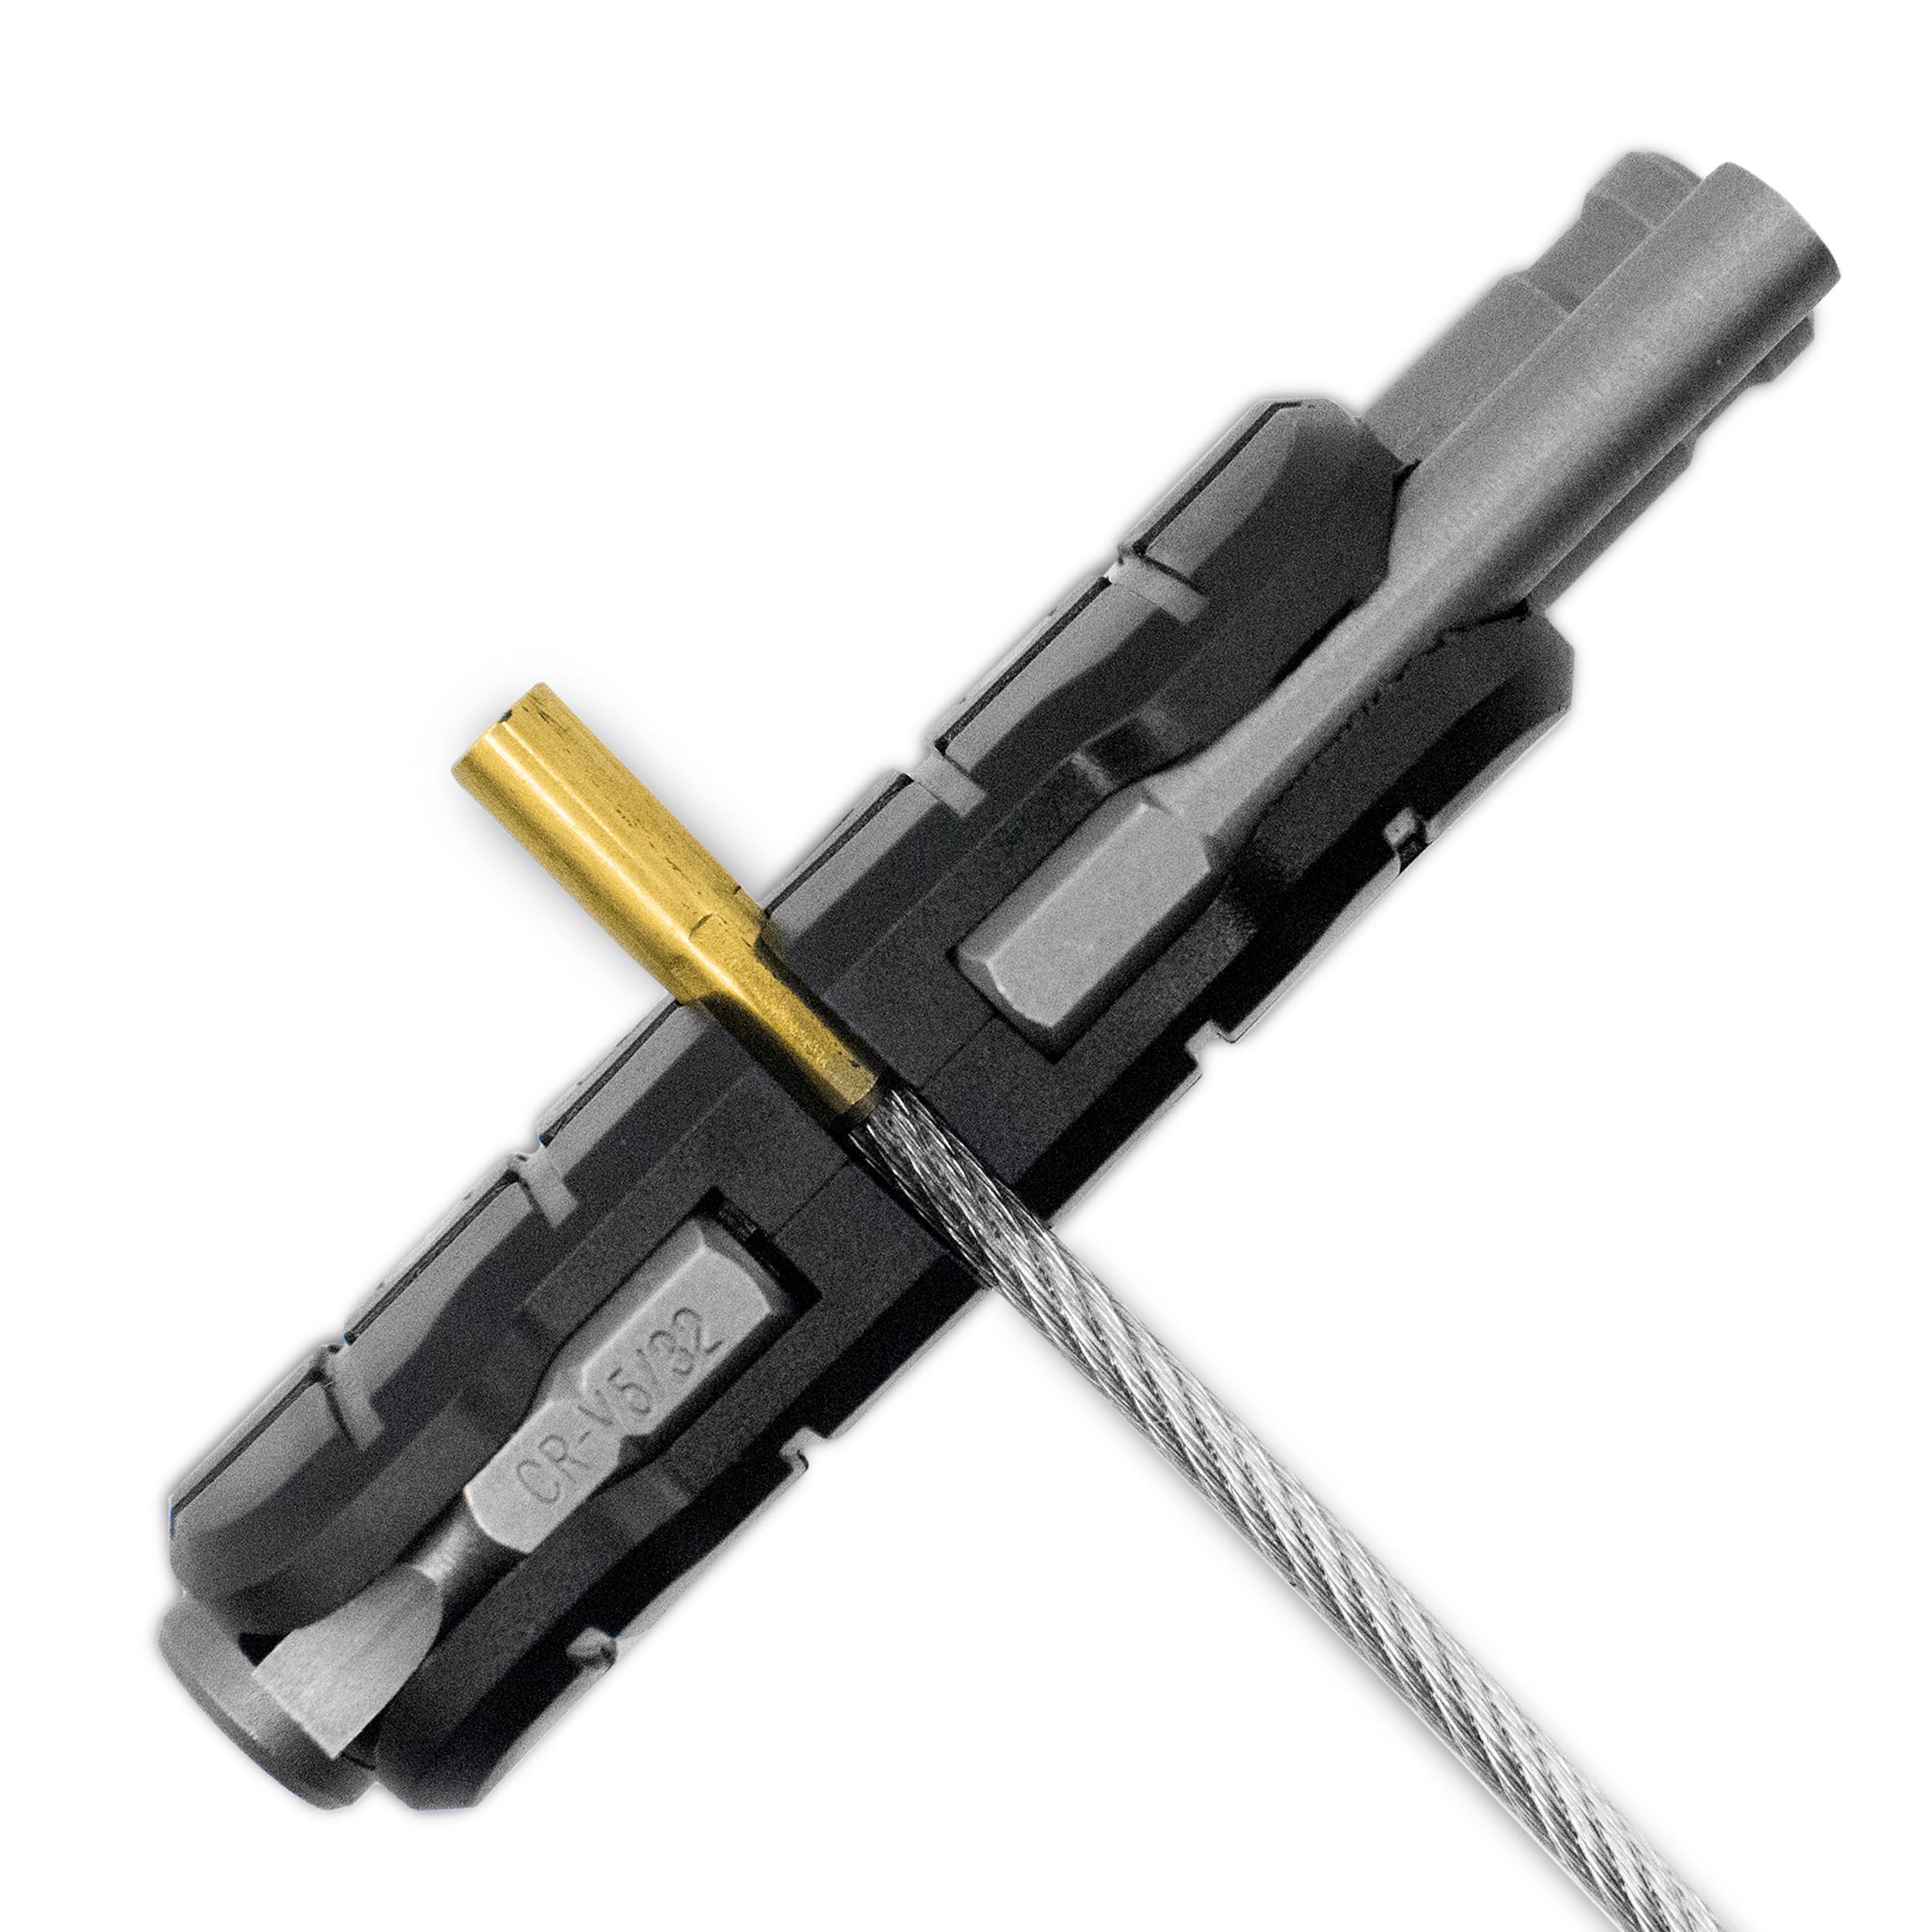 8-in-1 Pistol T-Tool